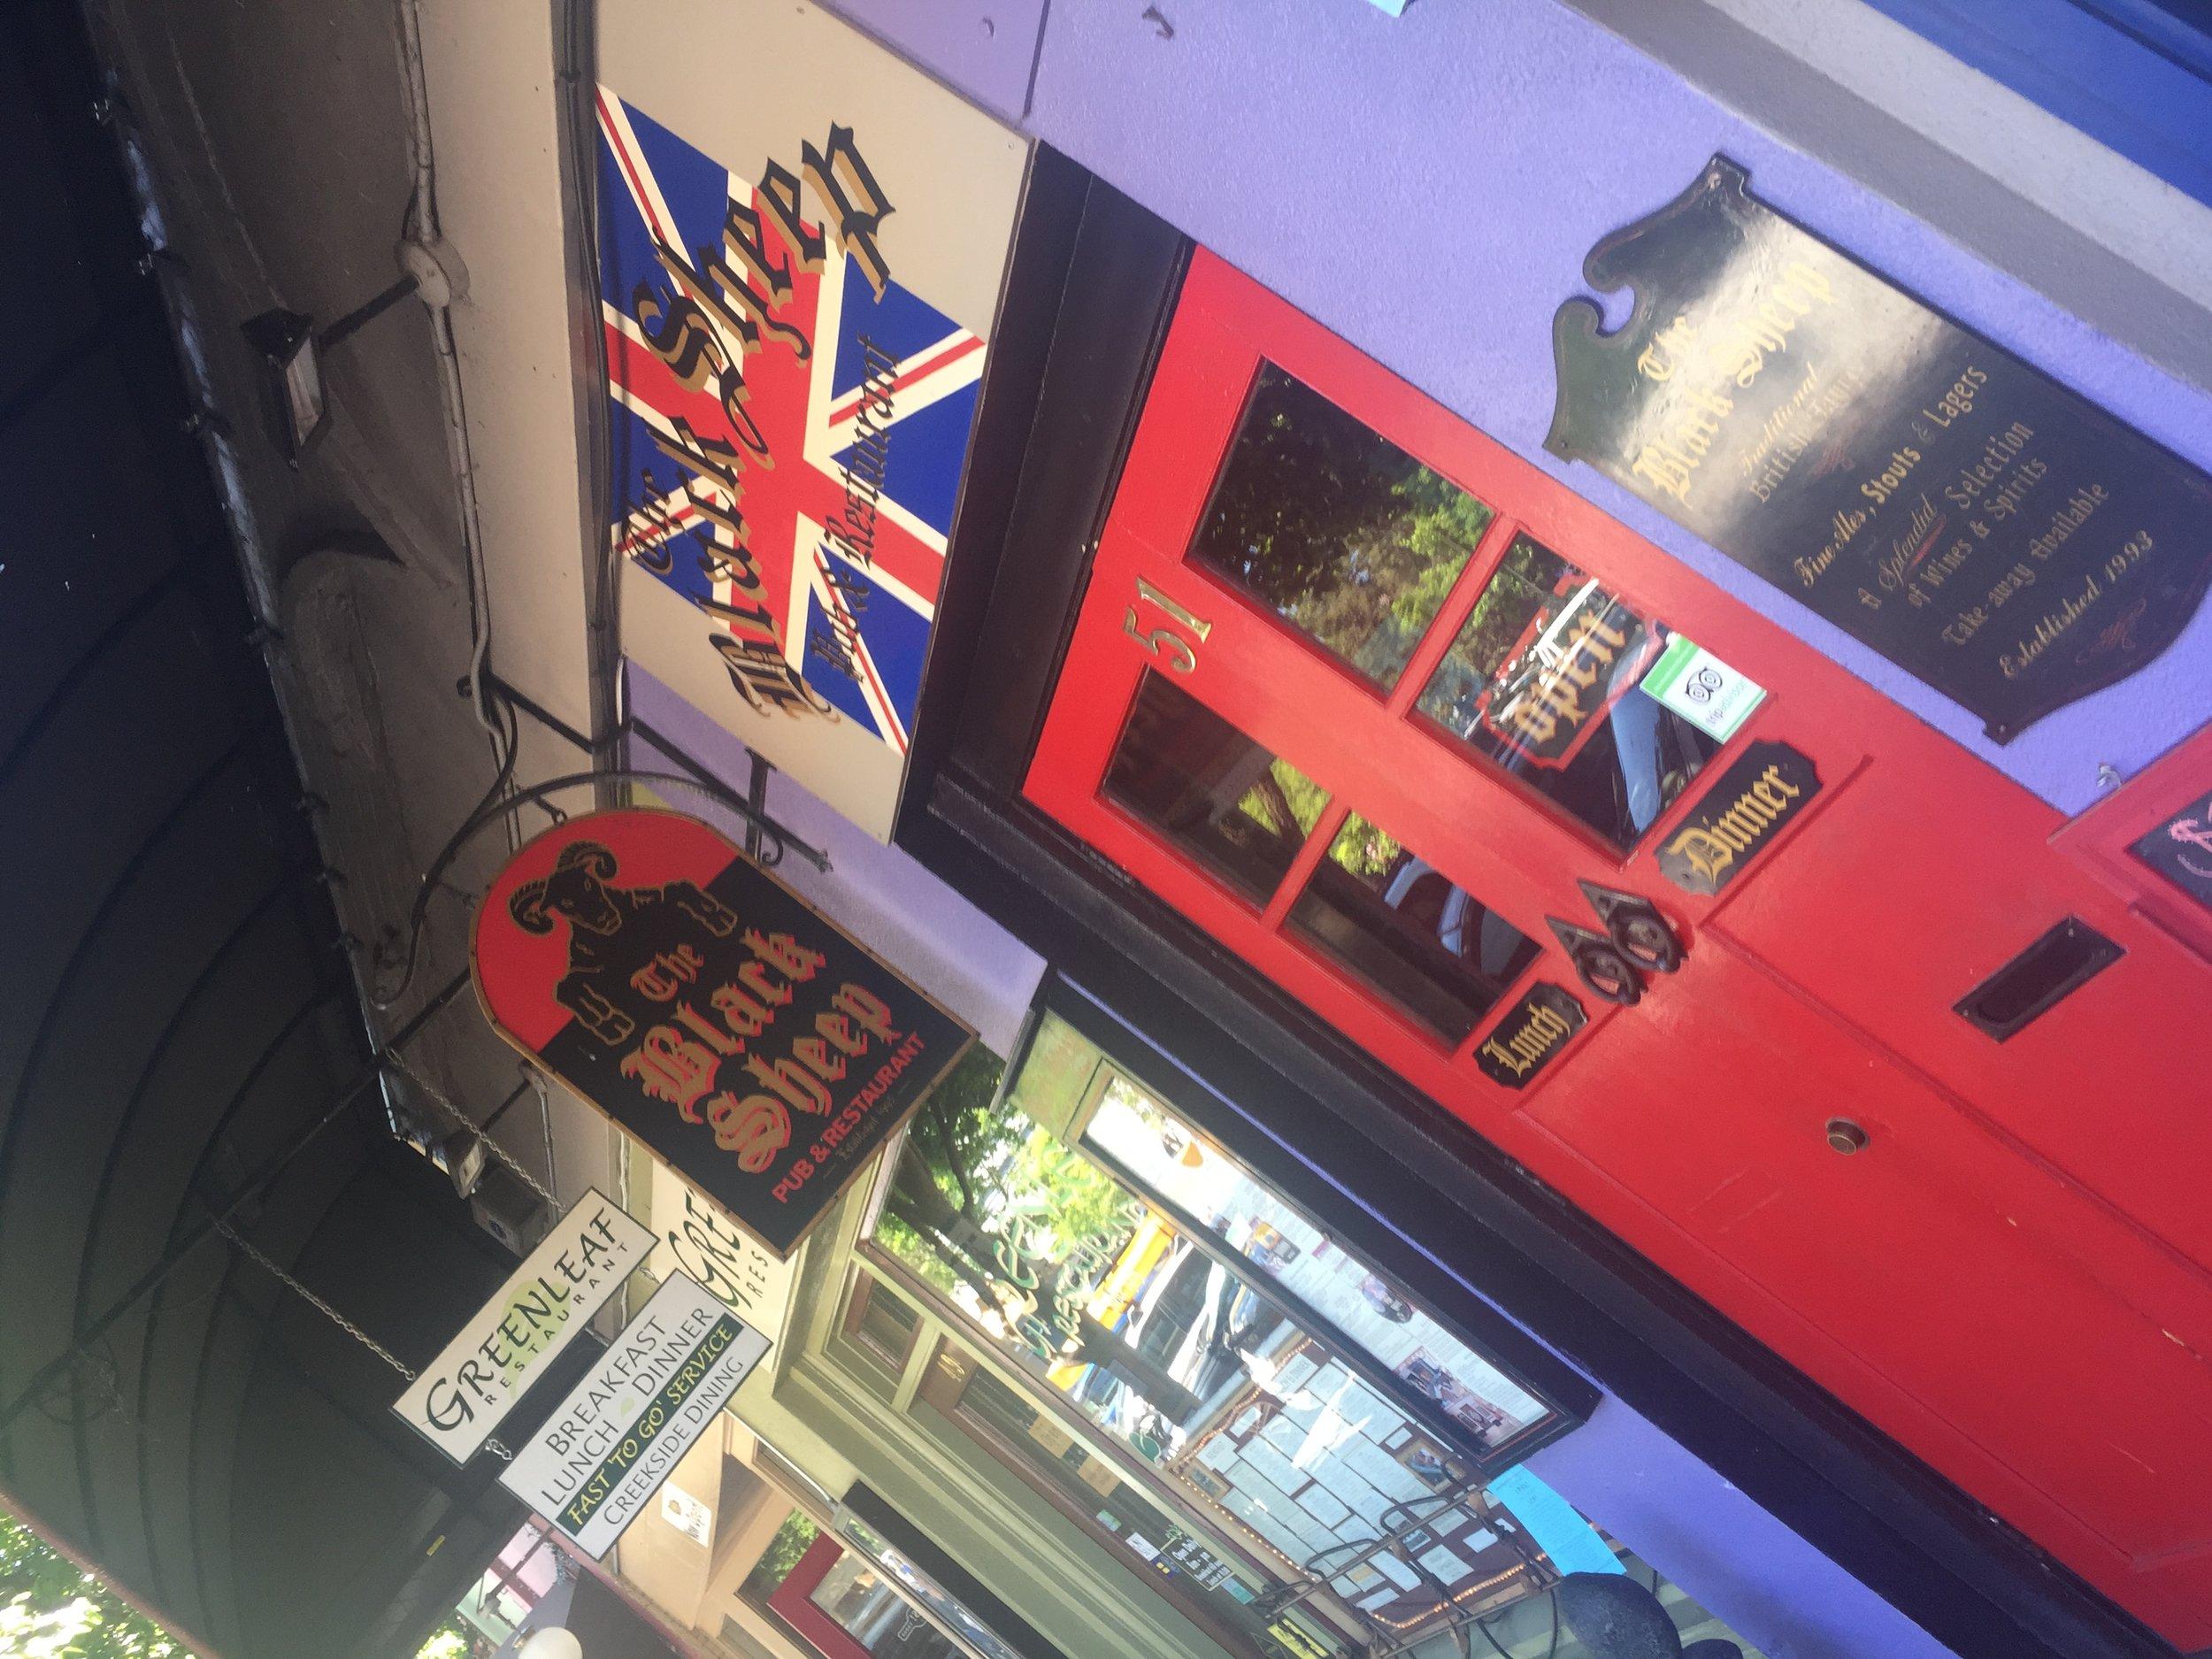 English pub The Black Sheep is no more. Closed down just last week